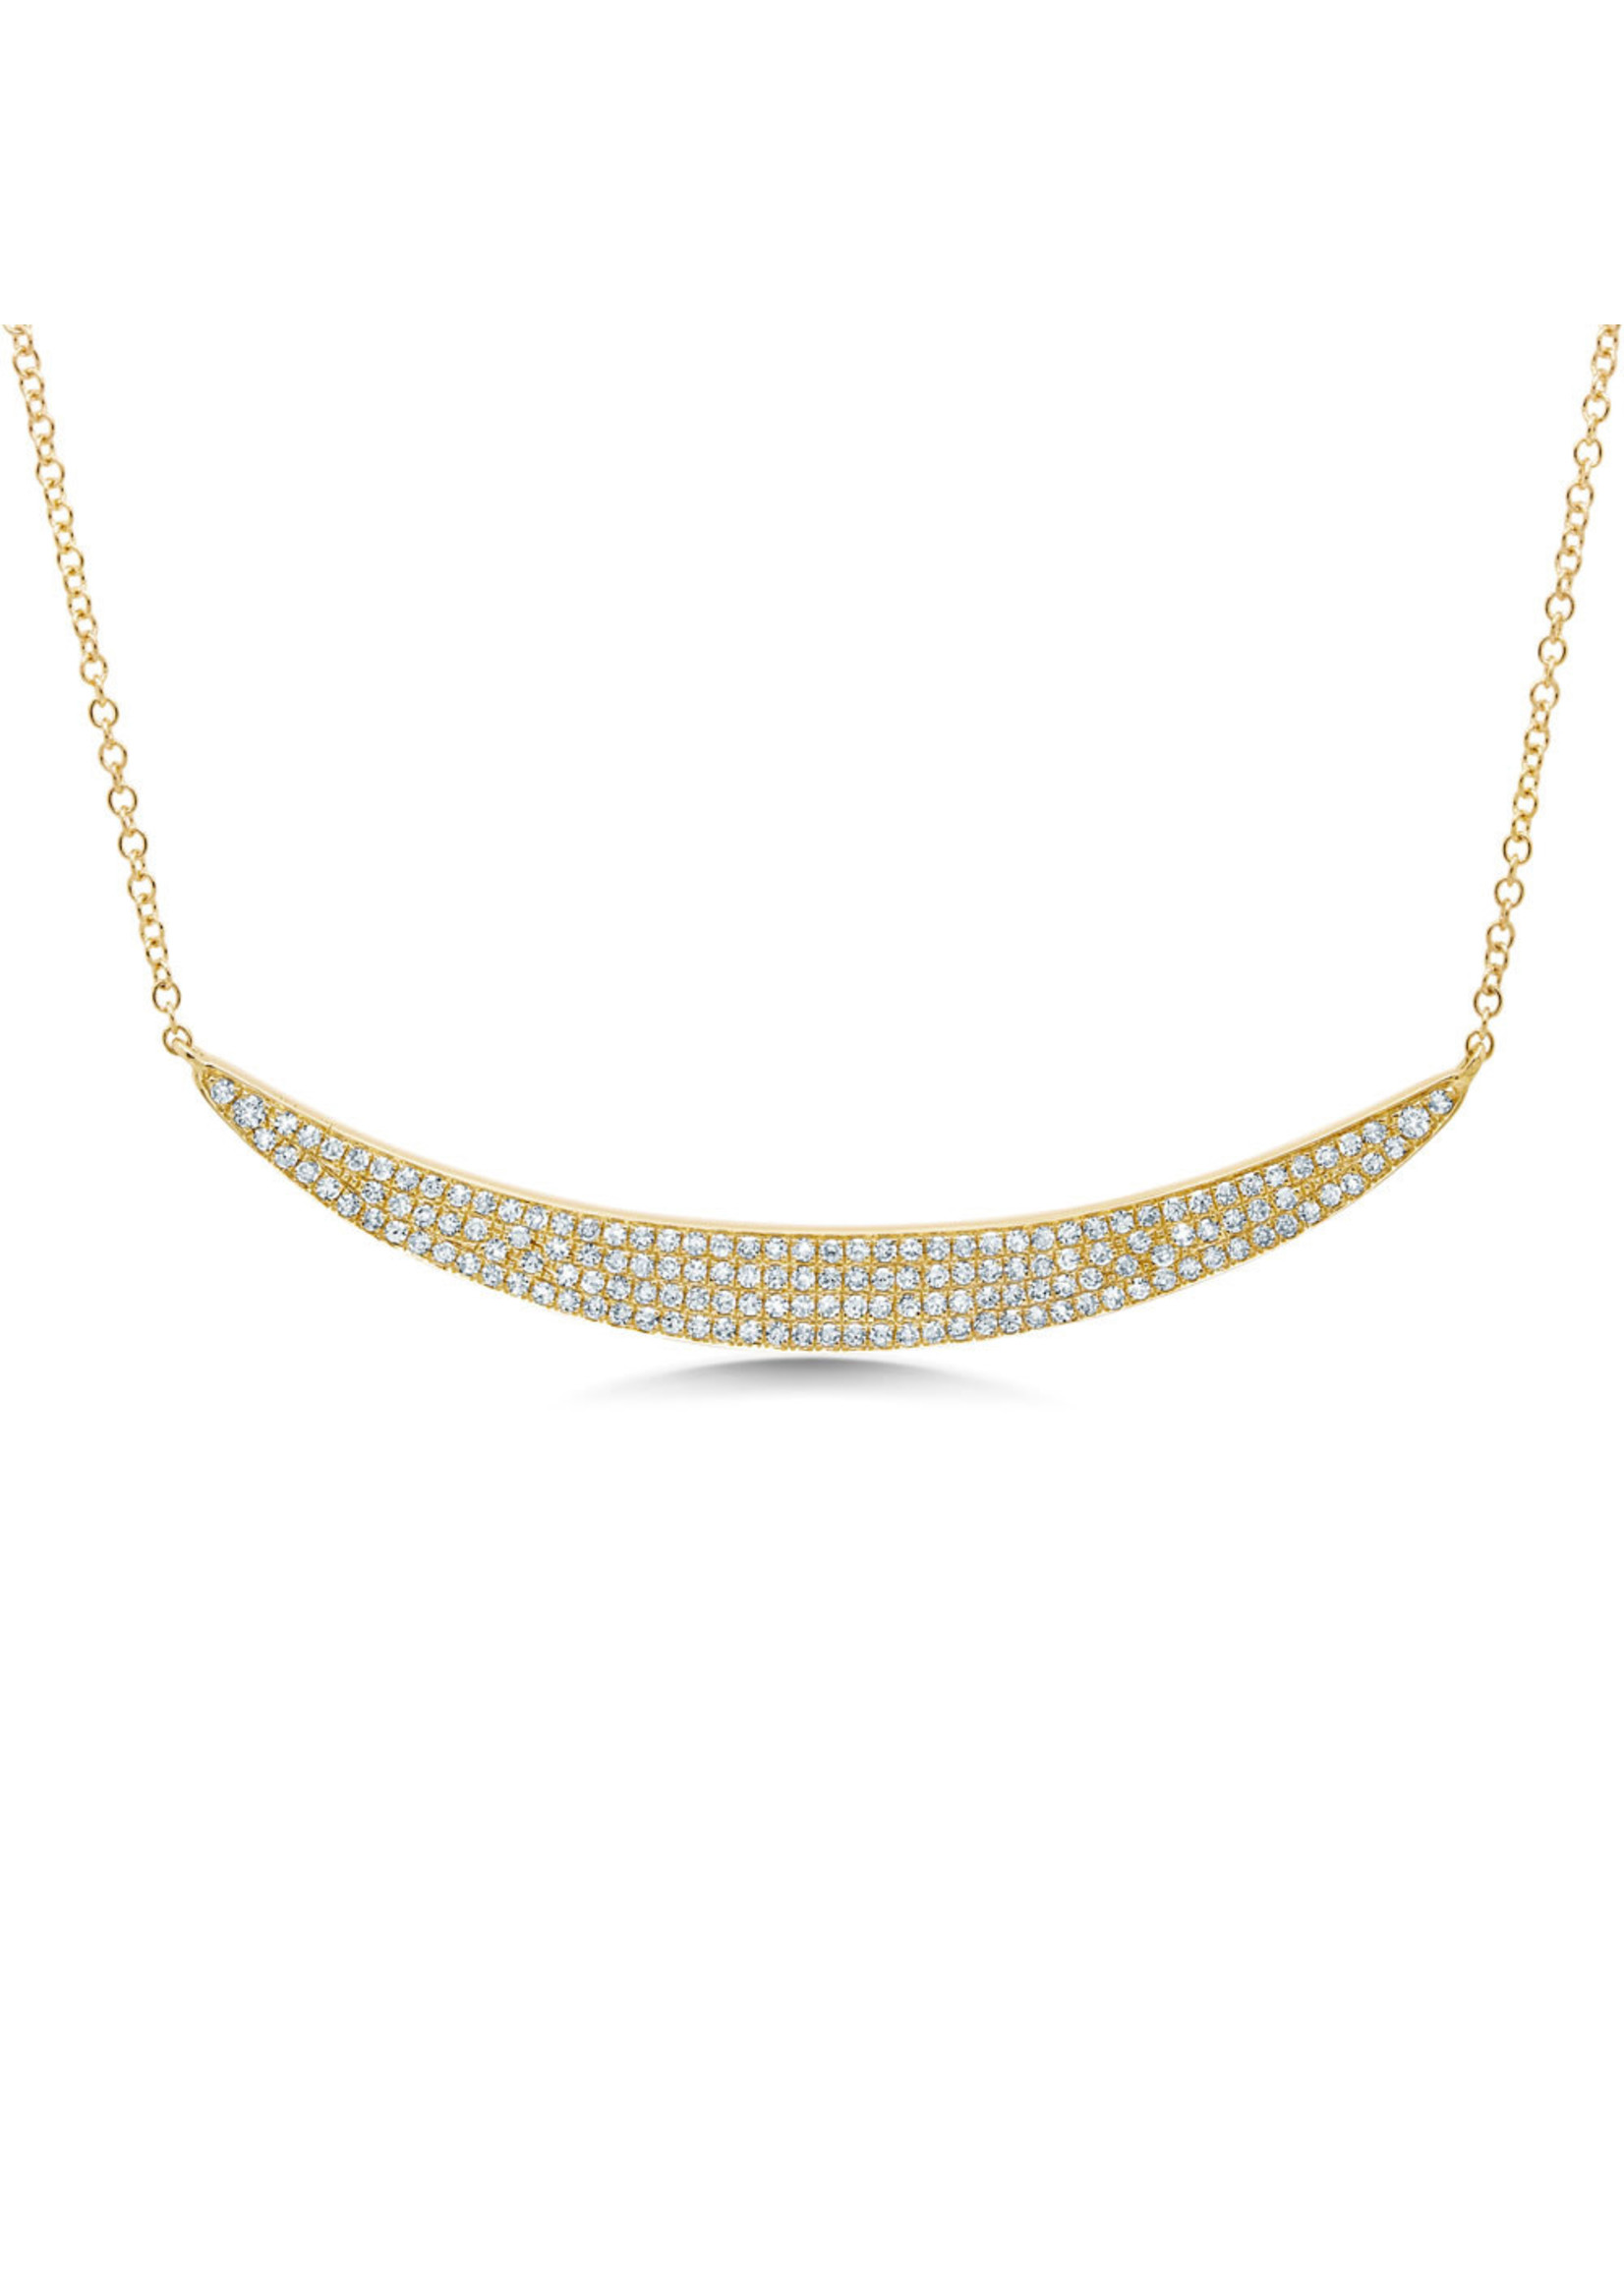 Jill Alberts Large Pave Diamond Crescent Necklace